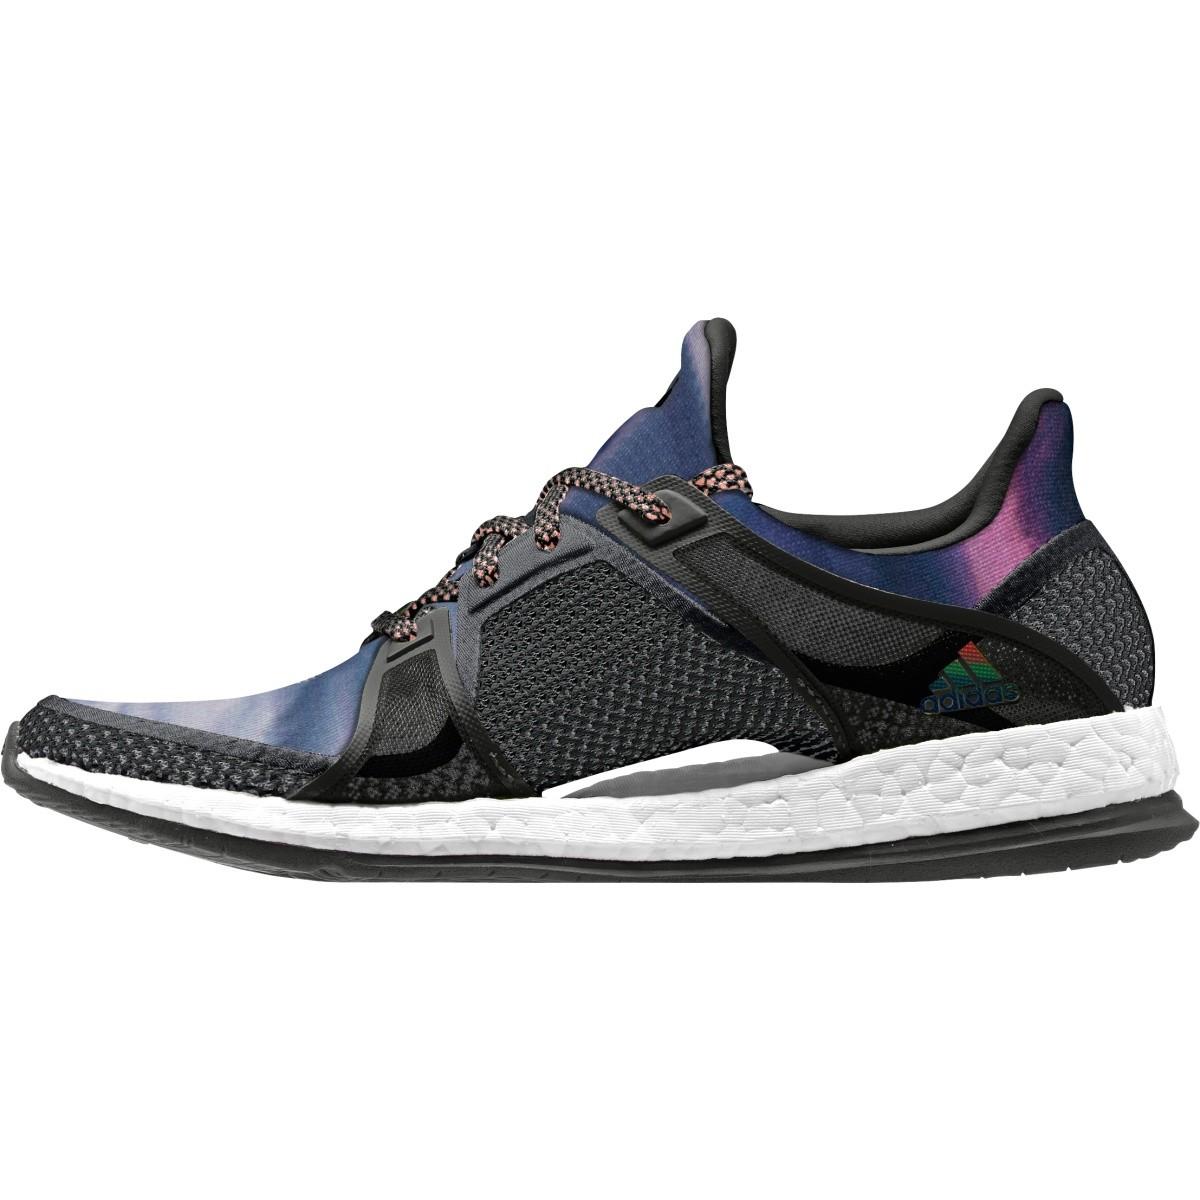 814c77e24 ... australia dámská fitness obuv adidas pure boost x tr w 45409 0e639